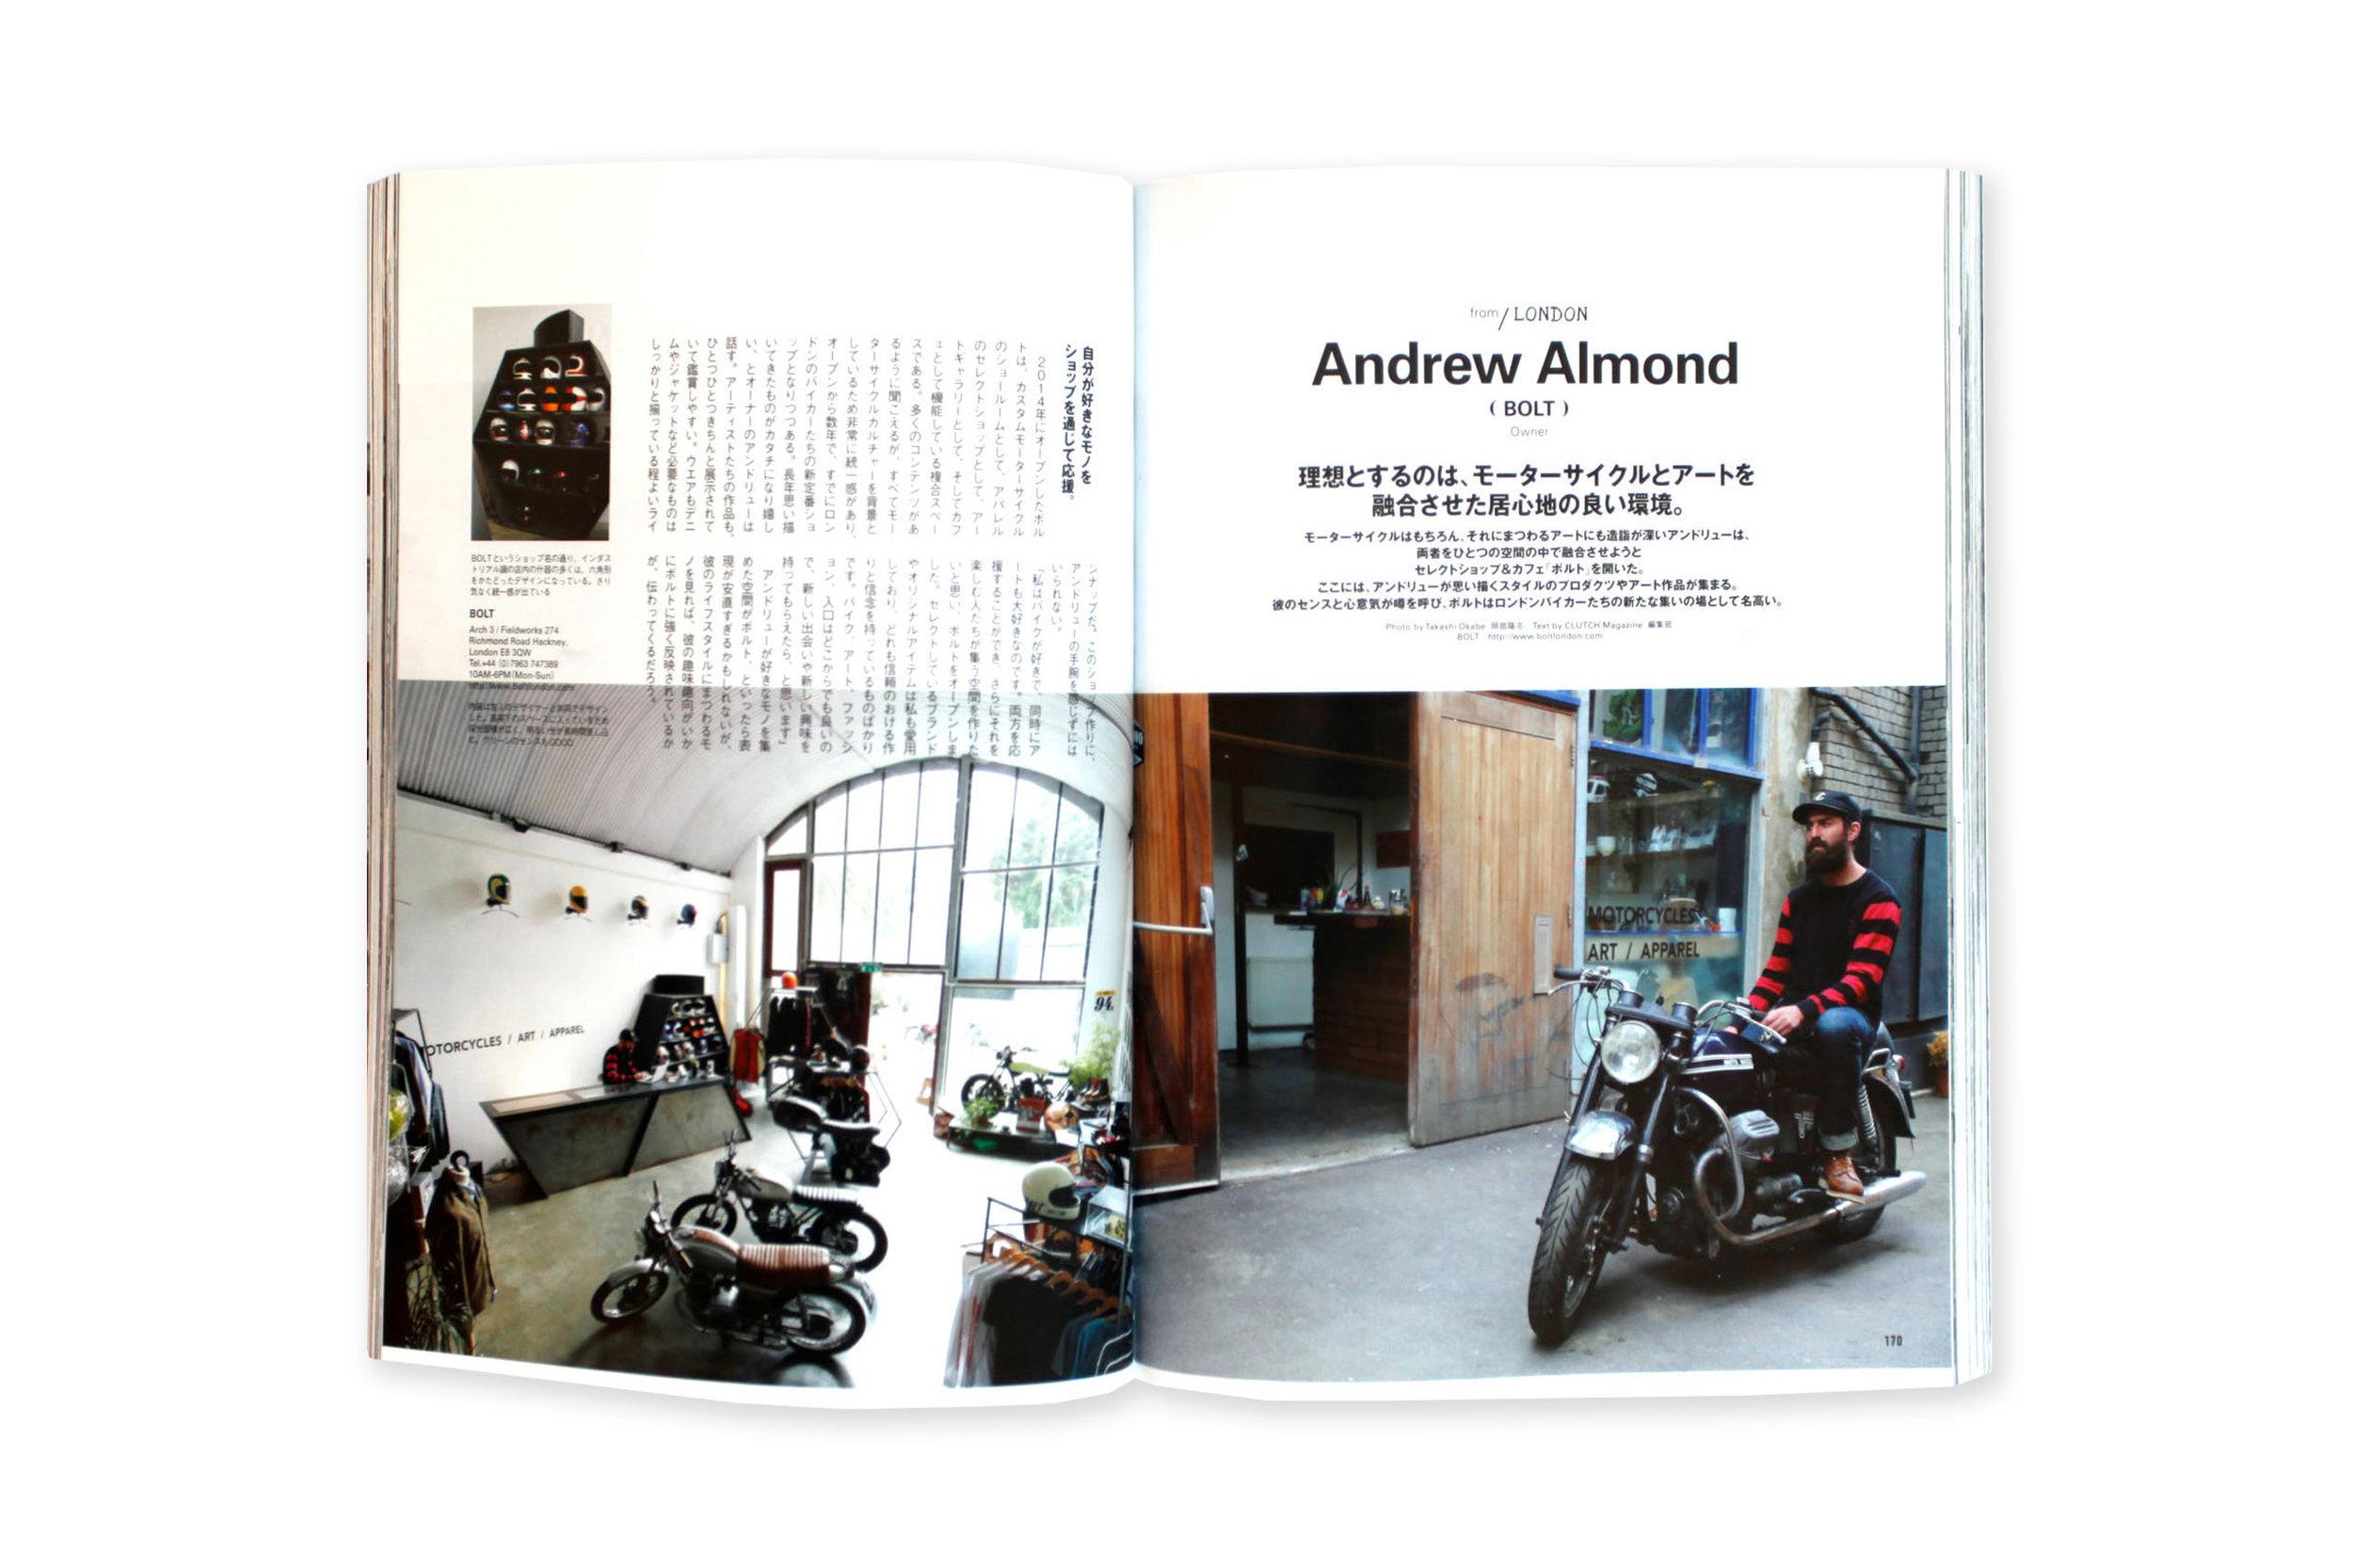 vintage motorcycles V179.jpg